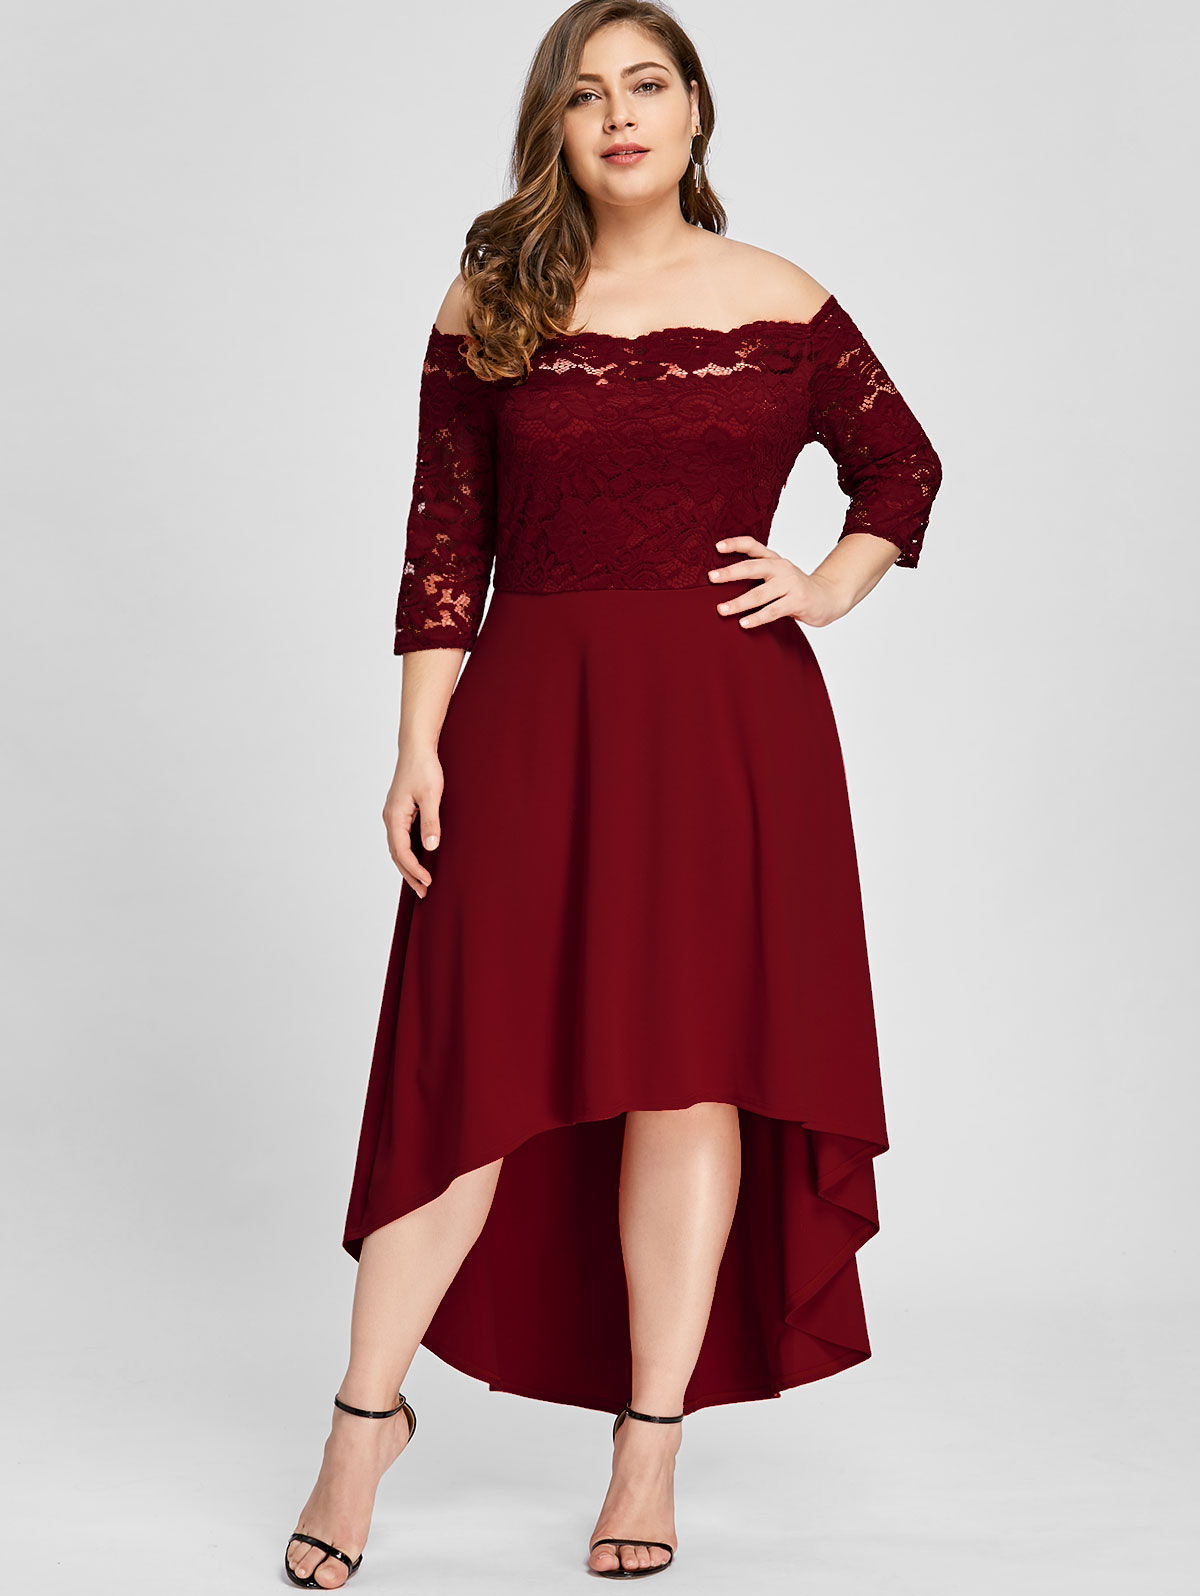 off shoulder cocktail dress plus size